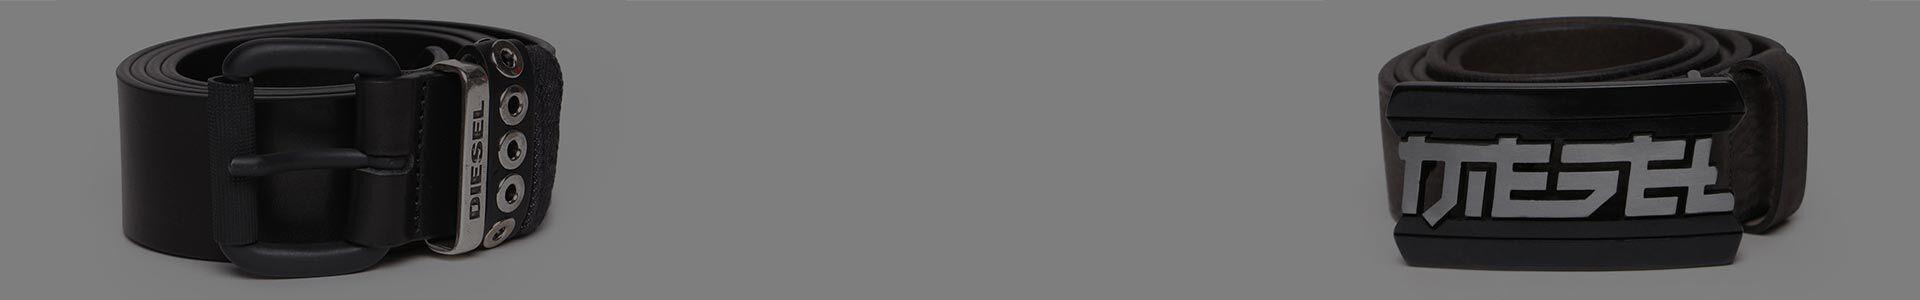 the Uomo Go · tessuto game pelle with Cinture o in 0dwRvPv